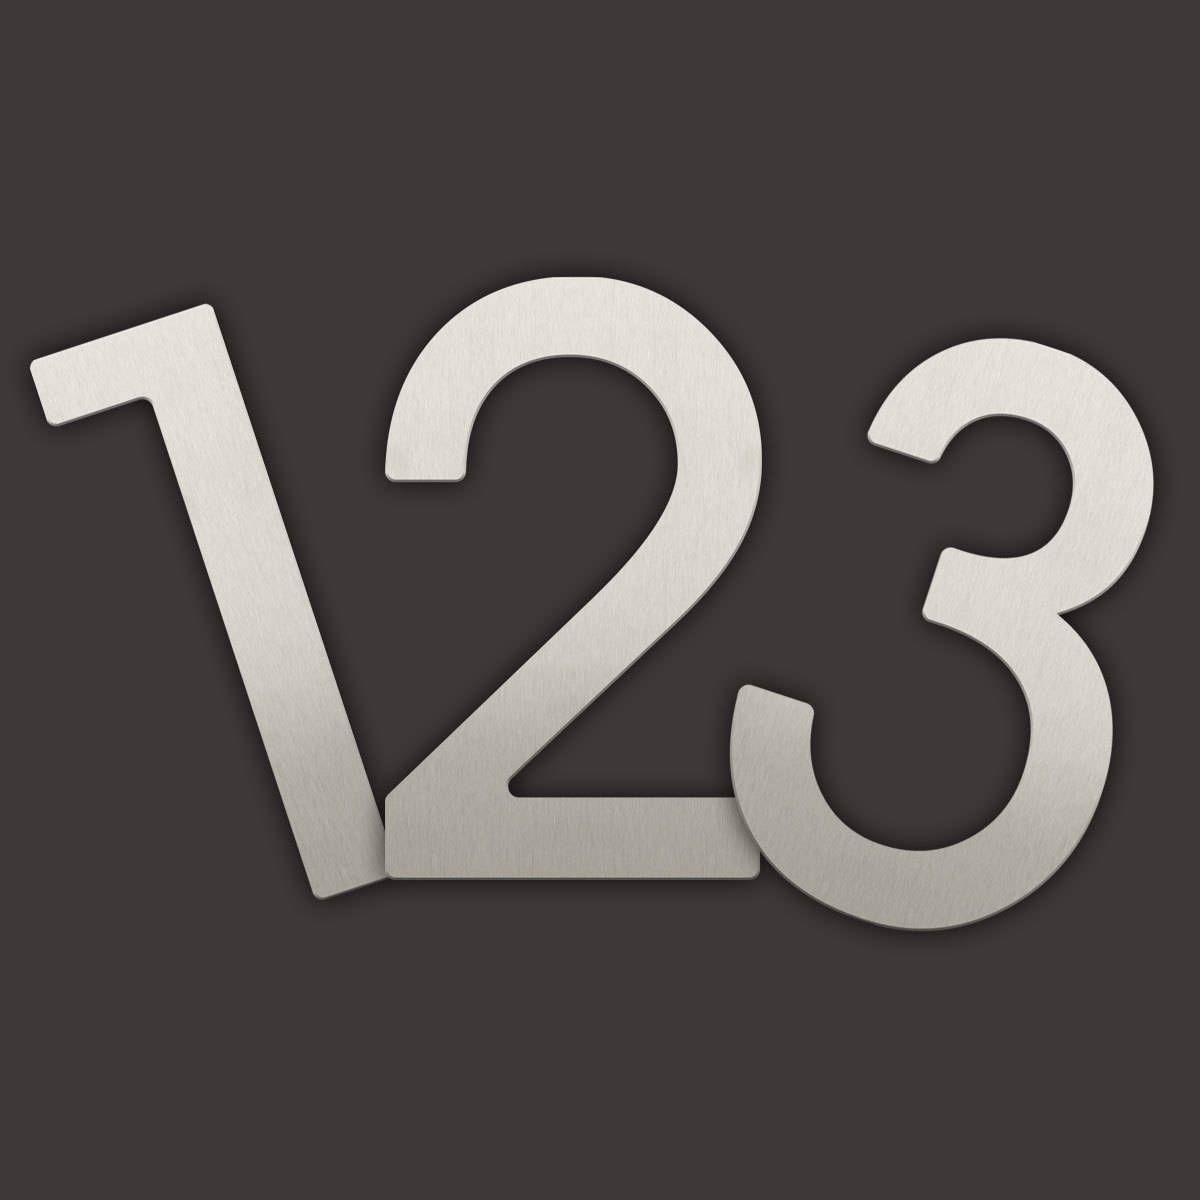 Moderne Hausnummern Edelstahl moderne design hausnummer aus hochwertigem edelstahl die